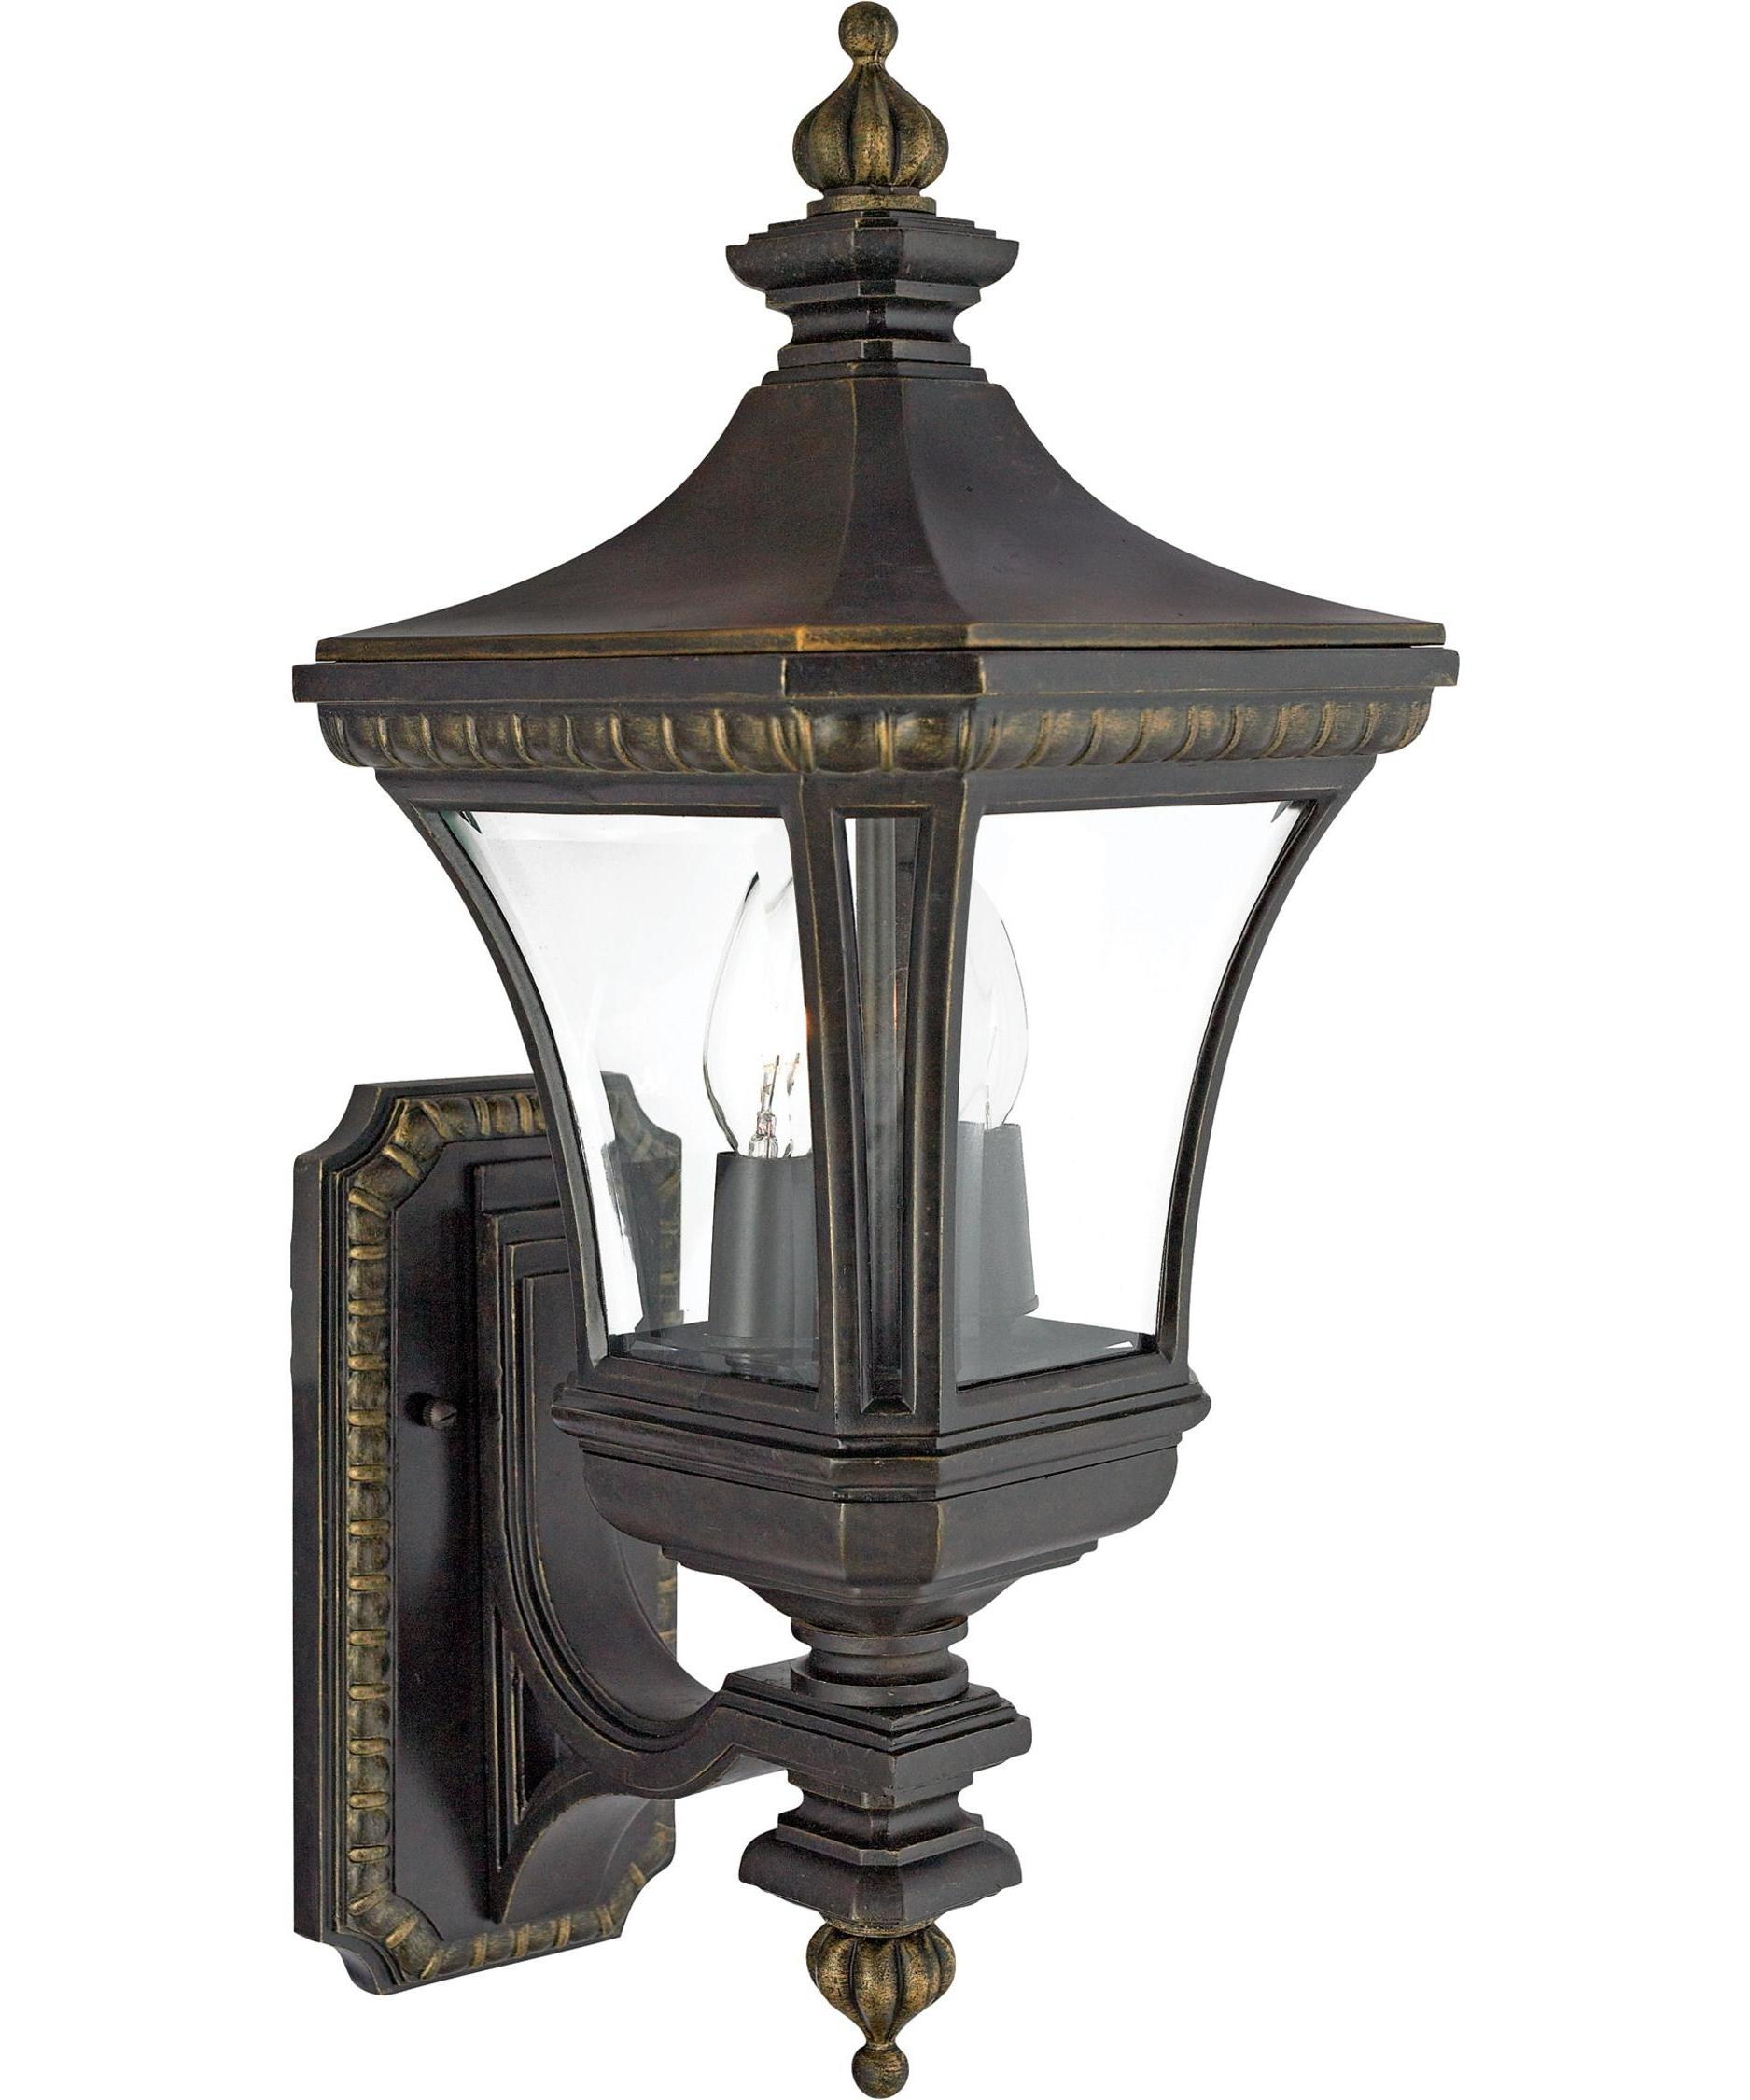 Popular Victorian Outdoor Lighting Luxury Ava Bathroom Pendant Light Fluted Intended For Victorian Outdoor Lanterns (Gallery 18 of 20)